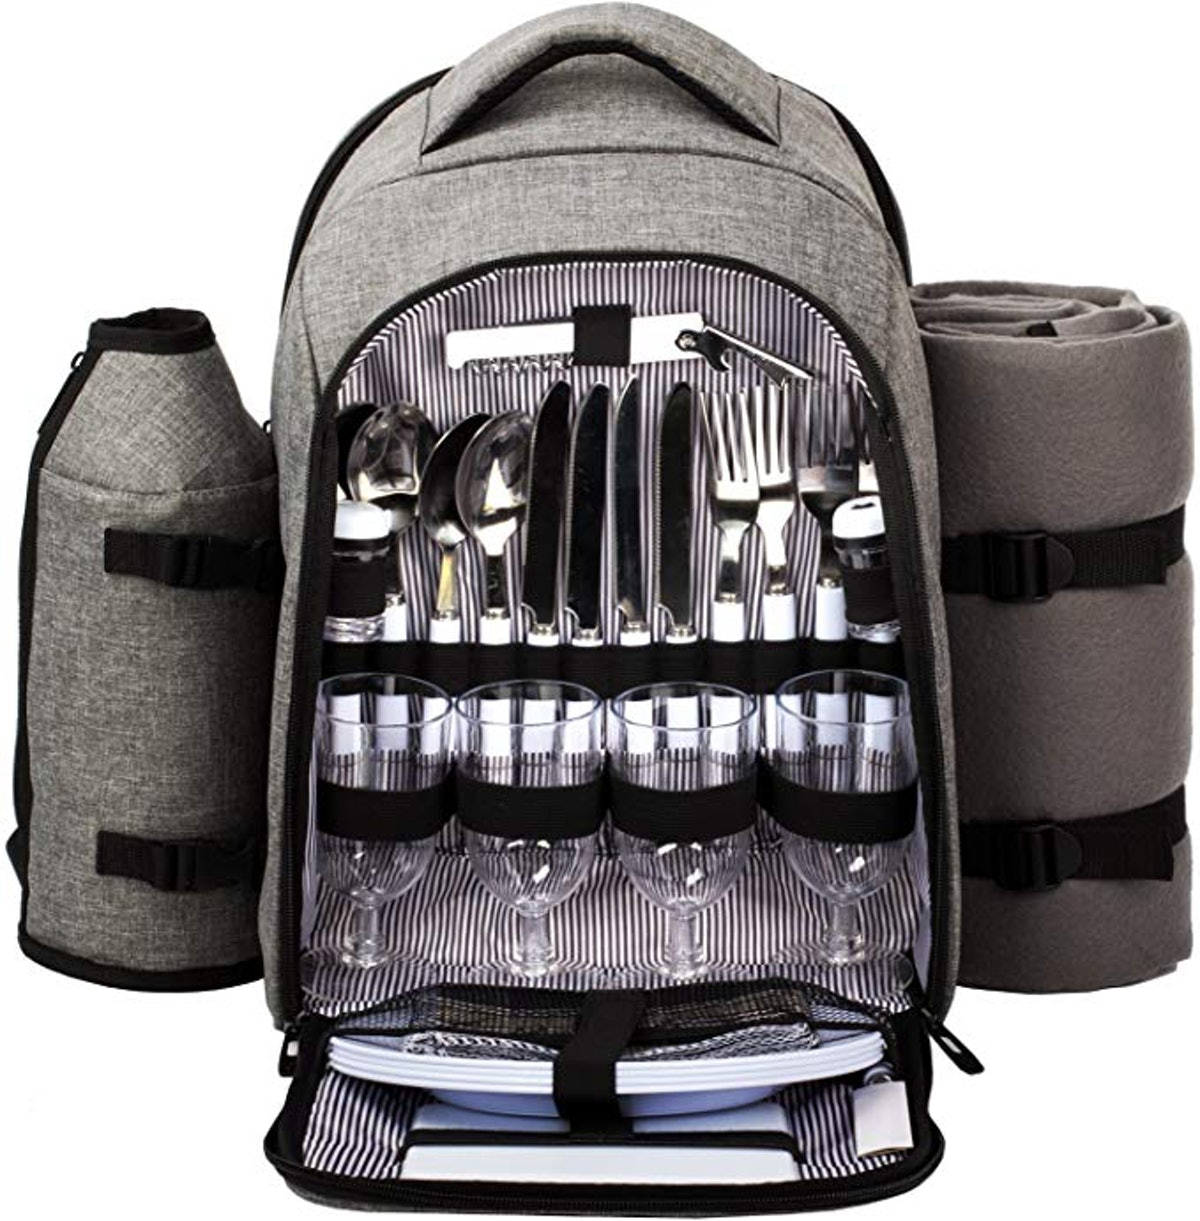 Hap Tim - Waterproof Picnic Backpack